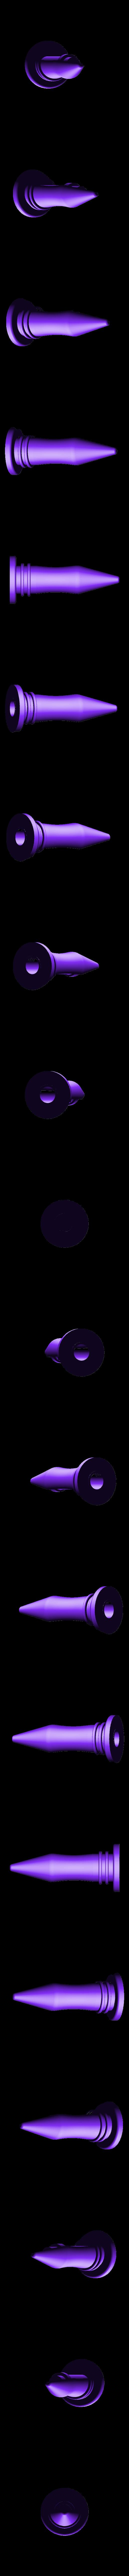 mañllar.stl Download free STL file Spool for thread • 3D printable design, firii18